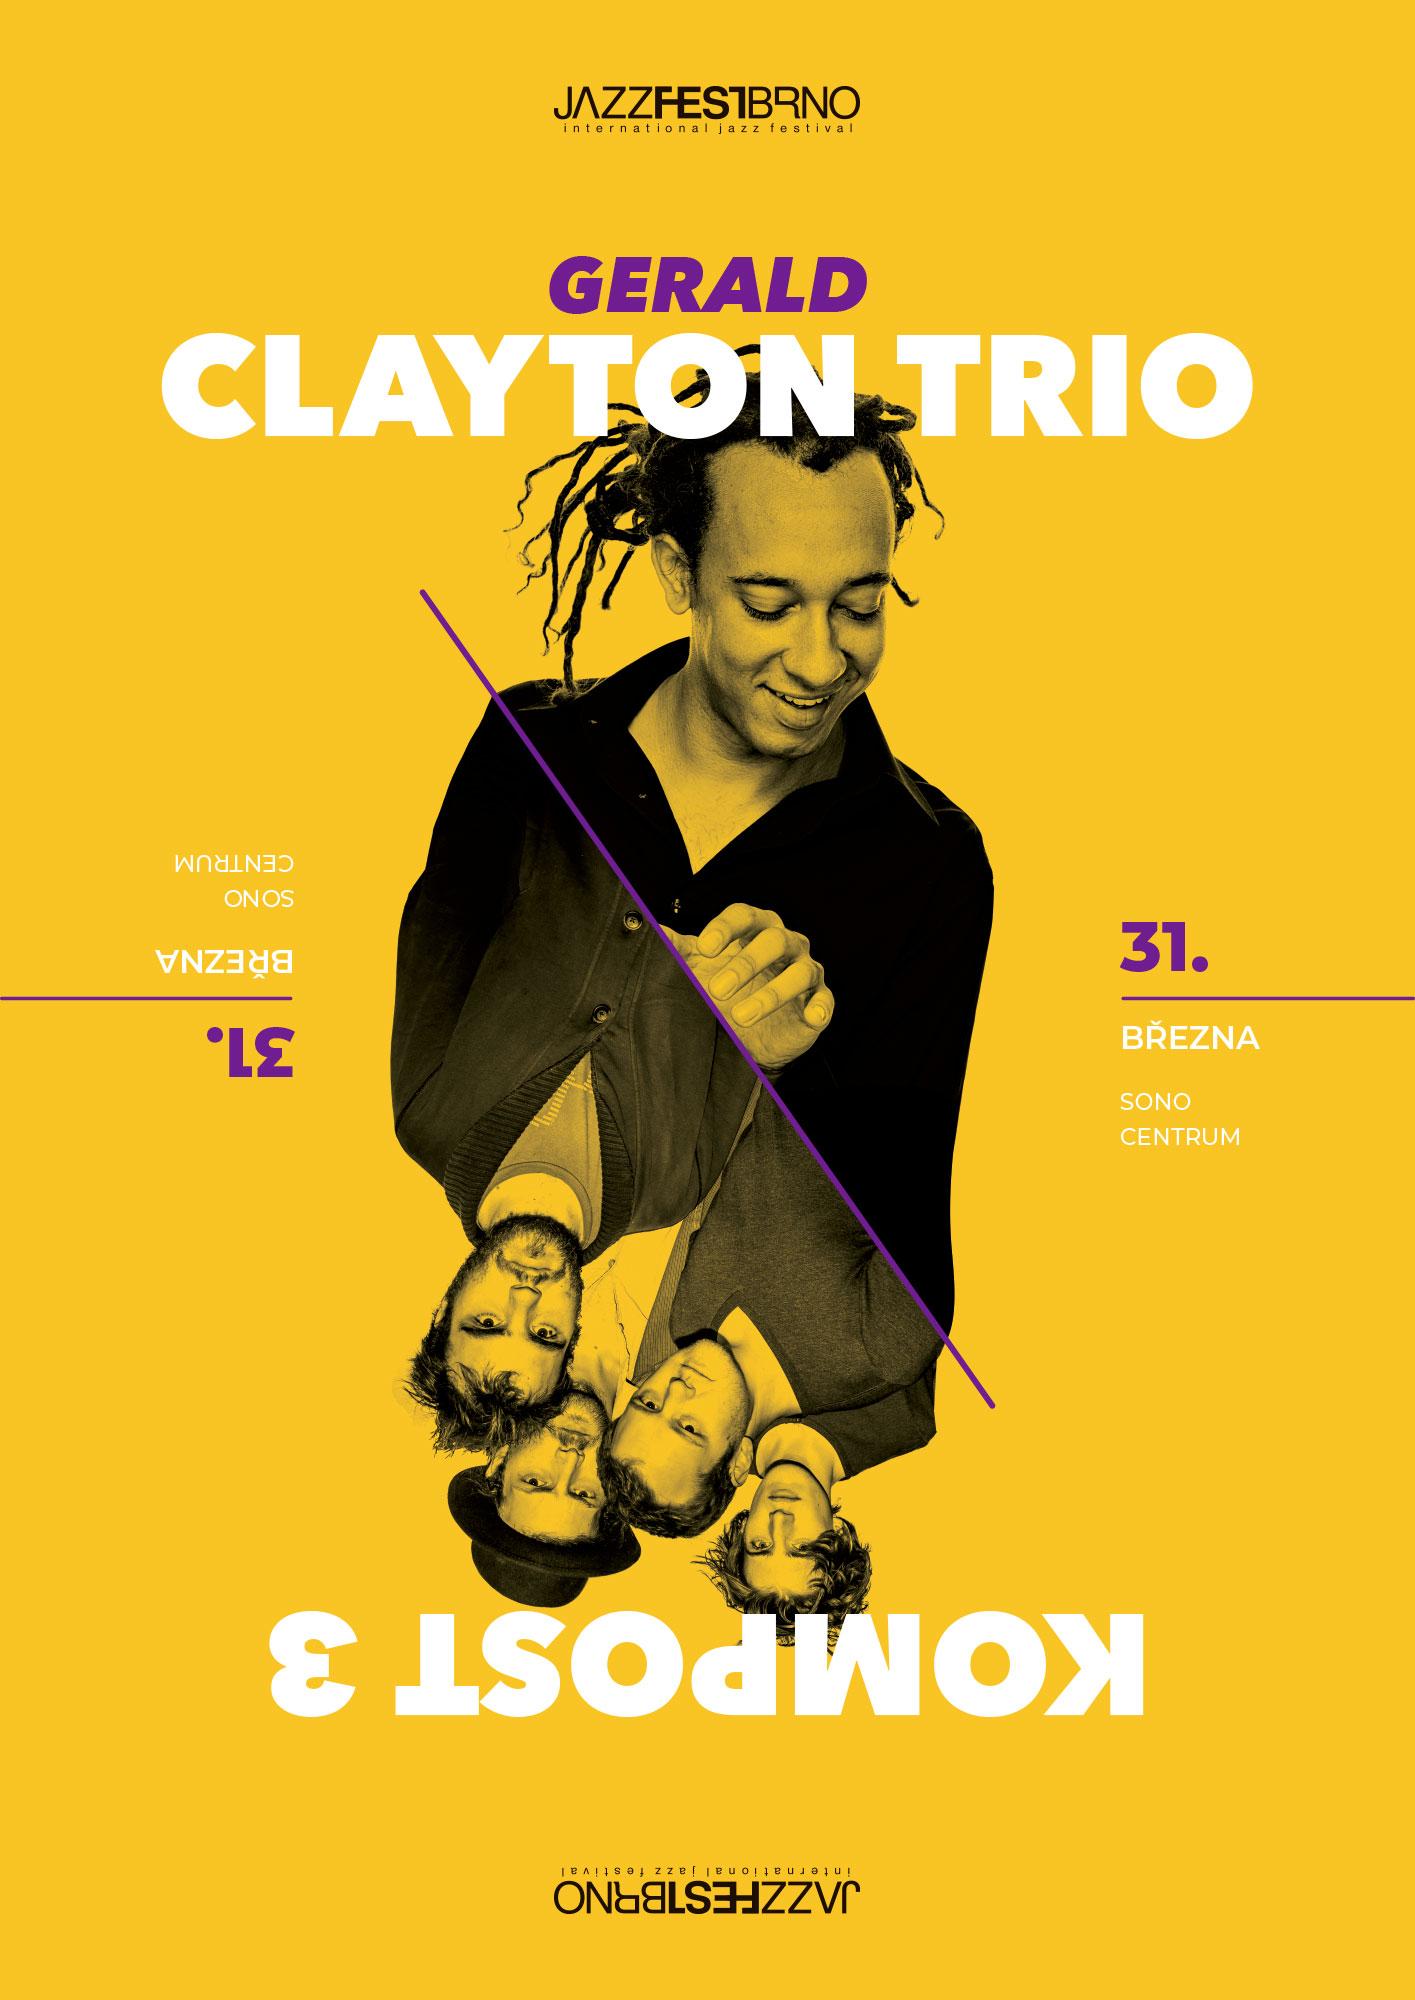 Jazzfestbrno 2015 - Gerald Clayton Trio & Kompost 3